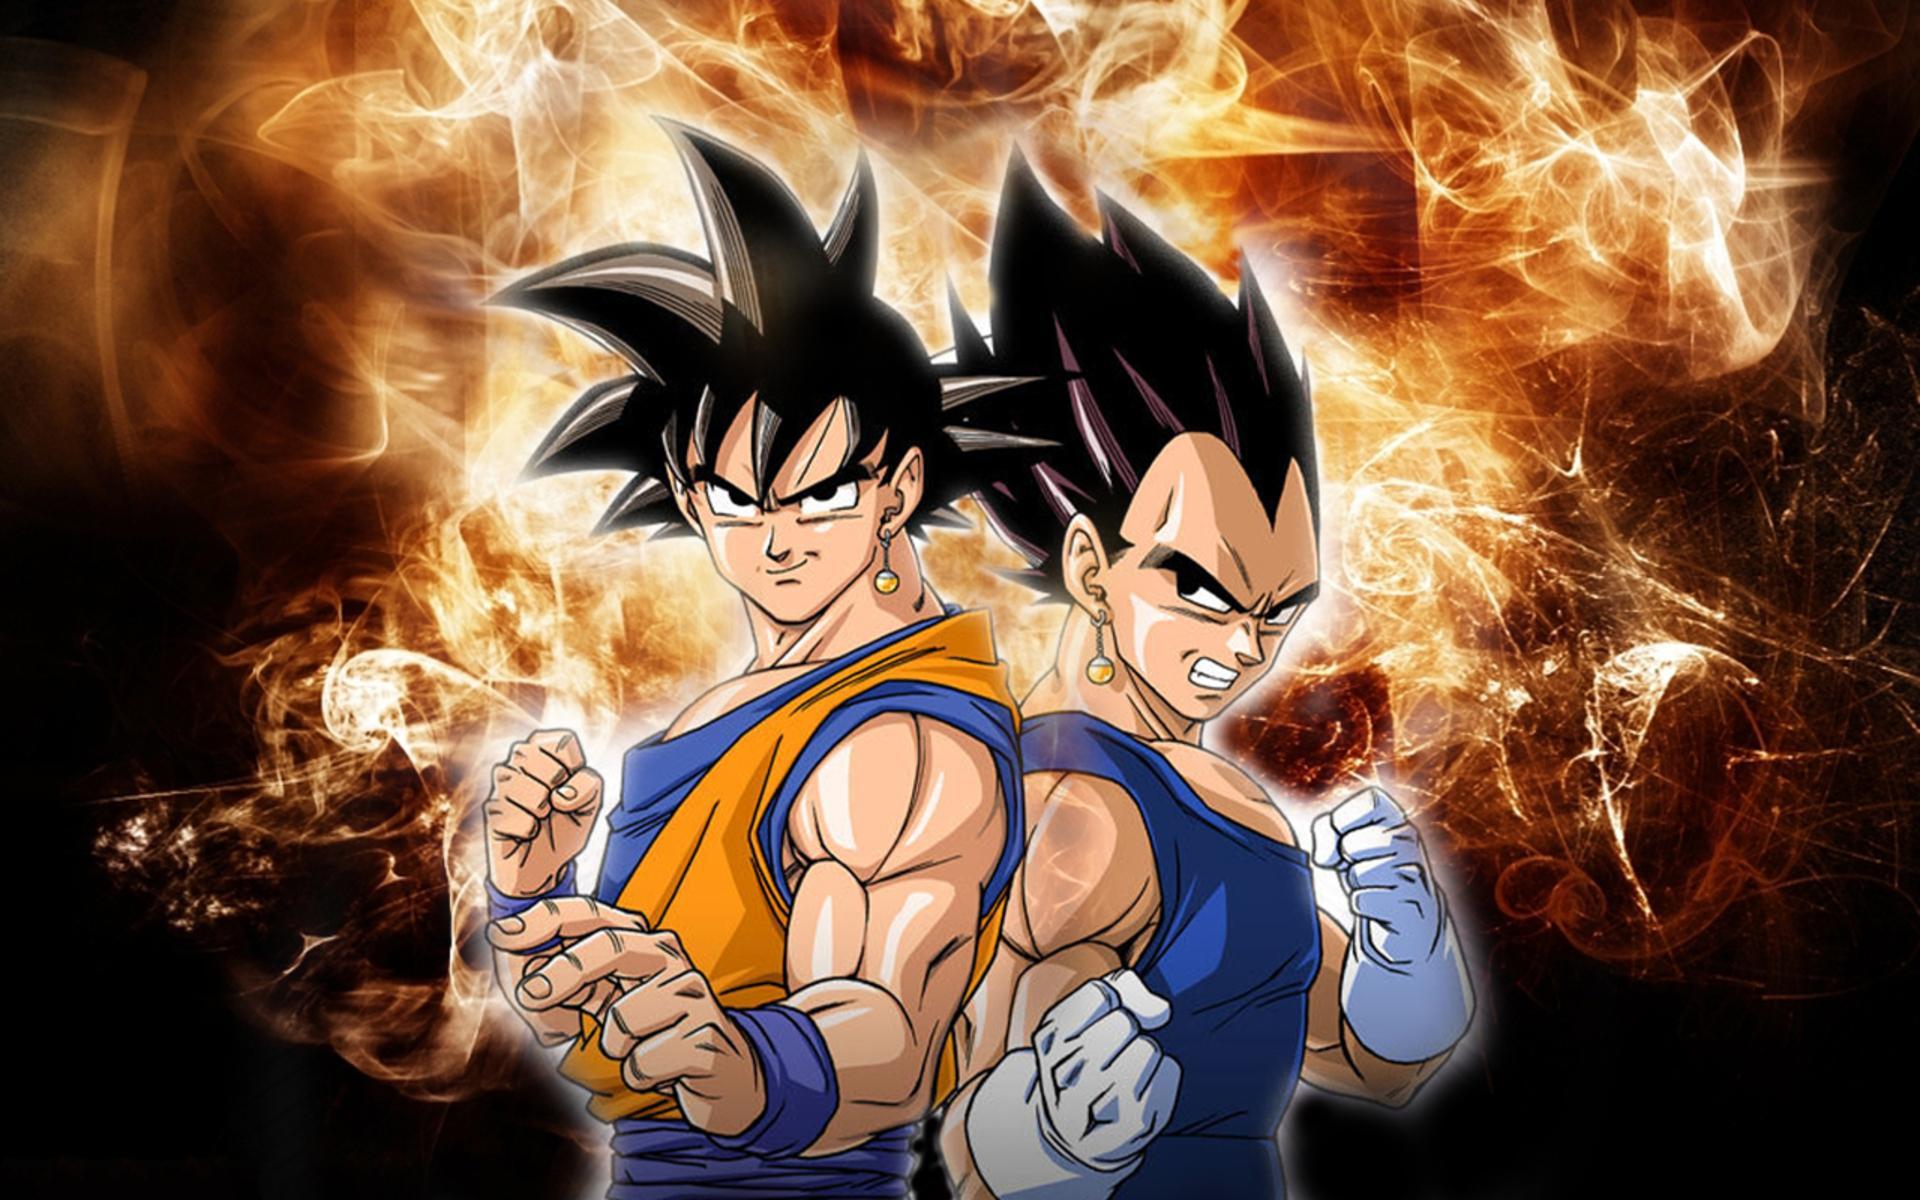 Free Download Goku Dragon Ball Z Backgrounds